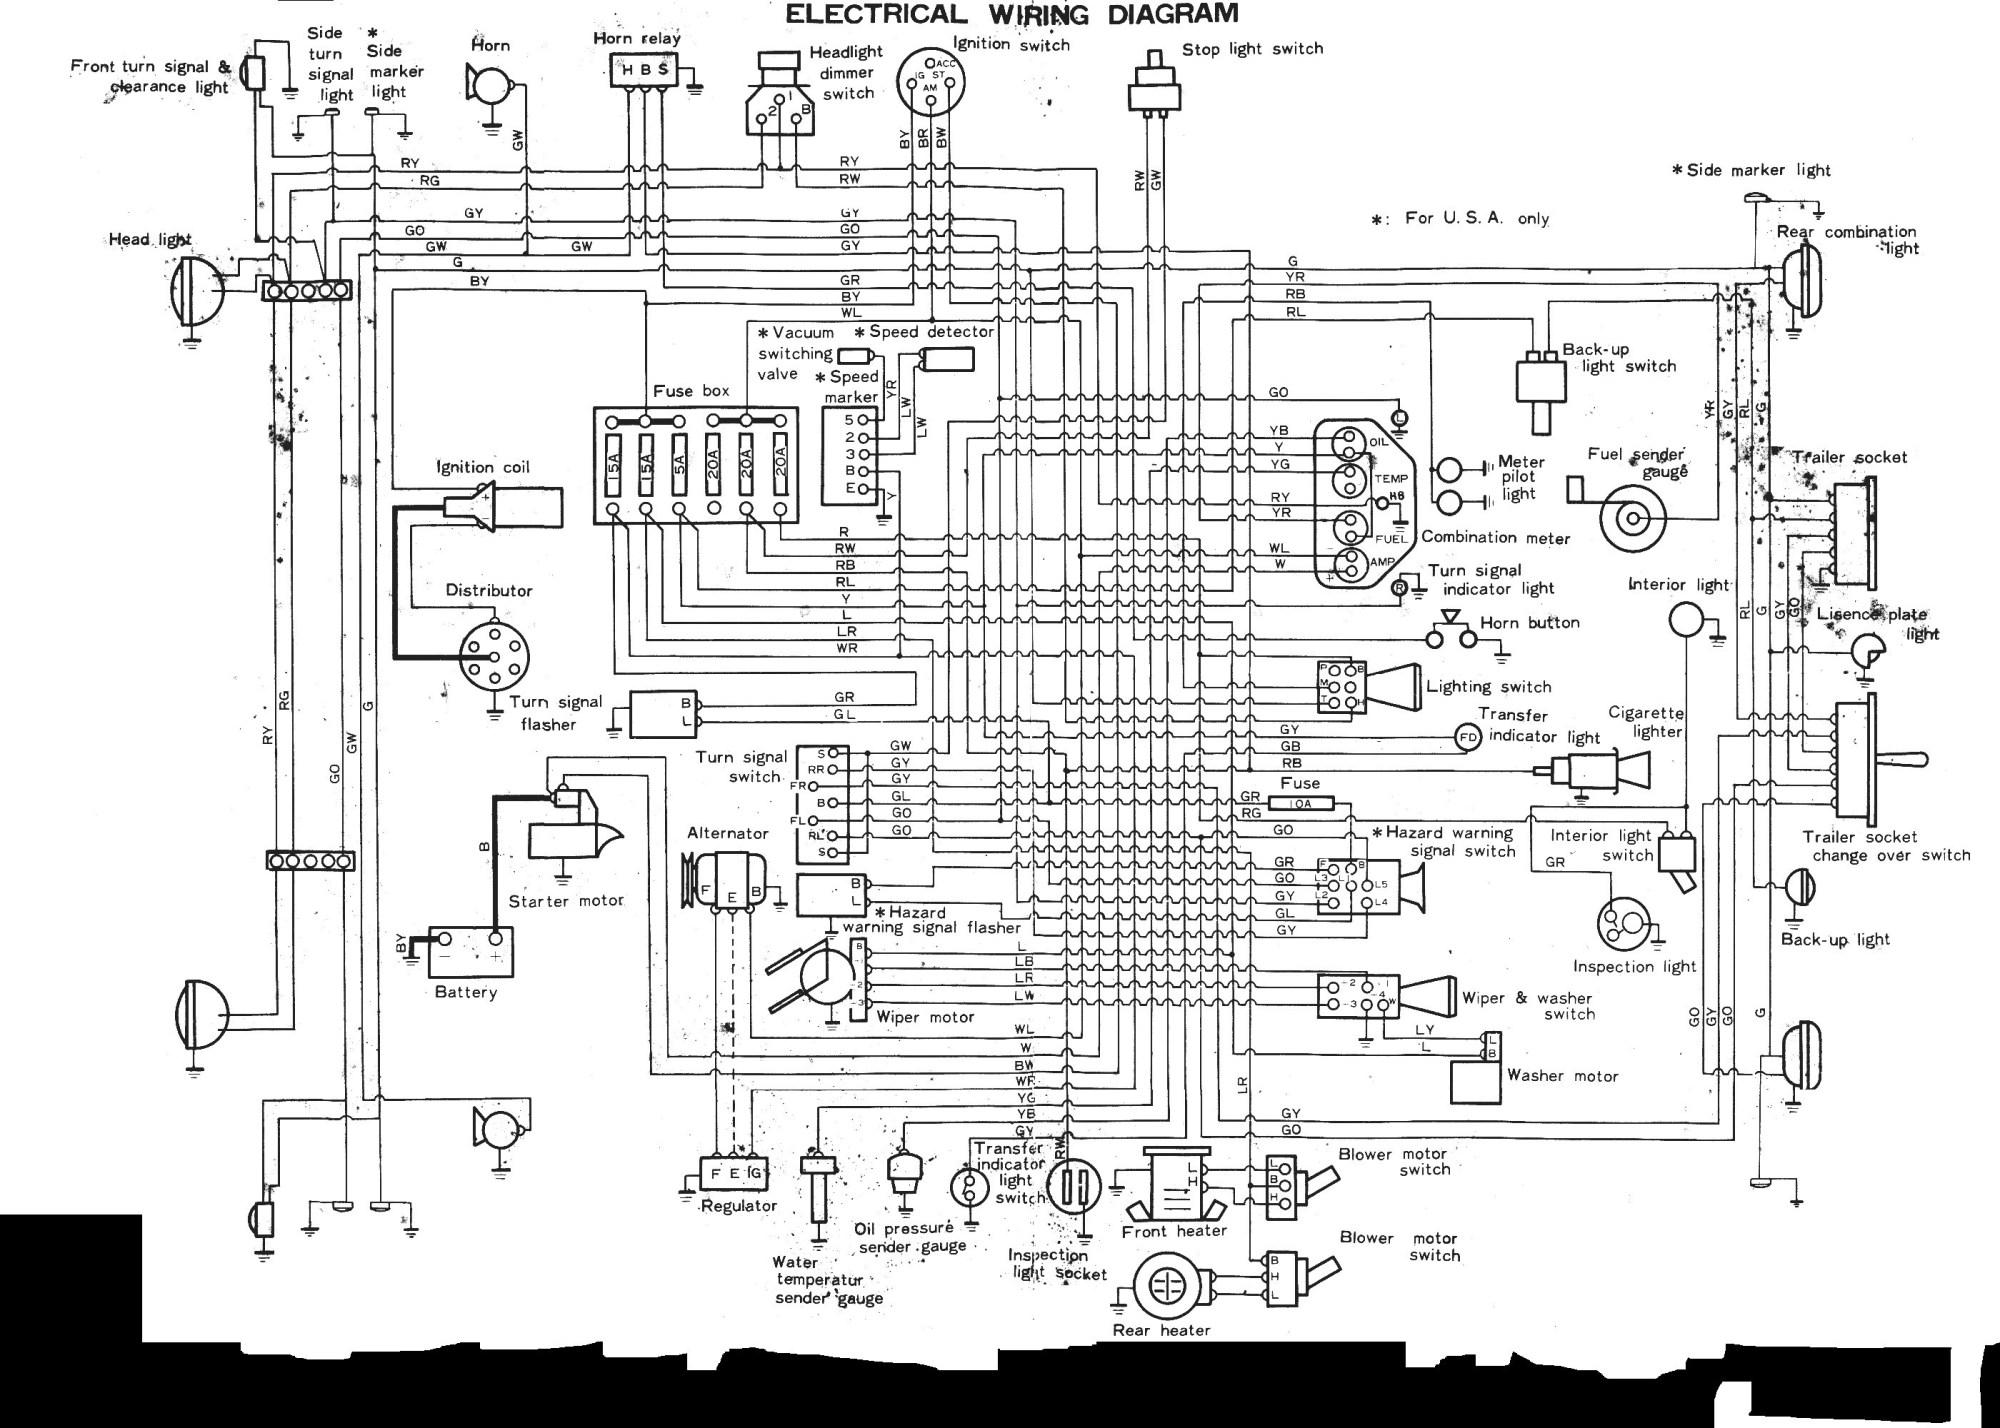 hight resolution of 2001 pt cruiser wiring diagram kia sportage fuel pump wiring diagram moreover 2006 pt cruiser